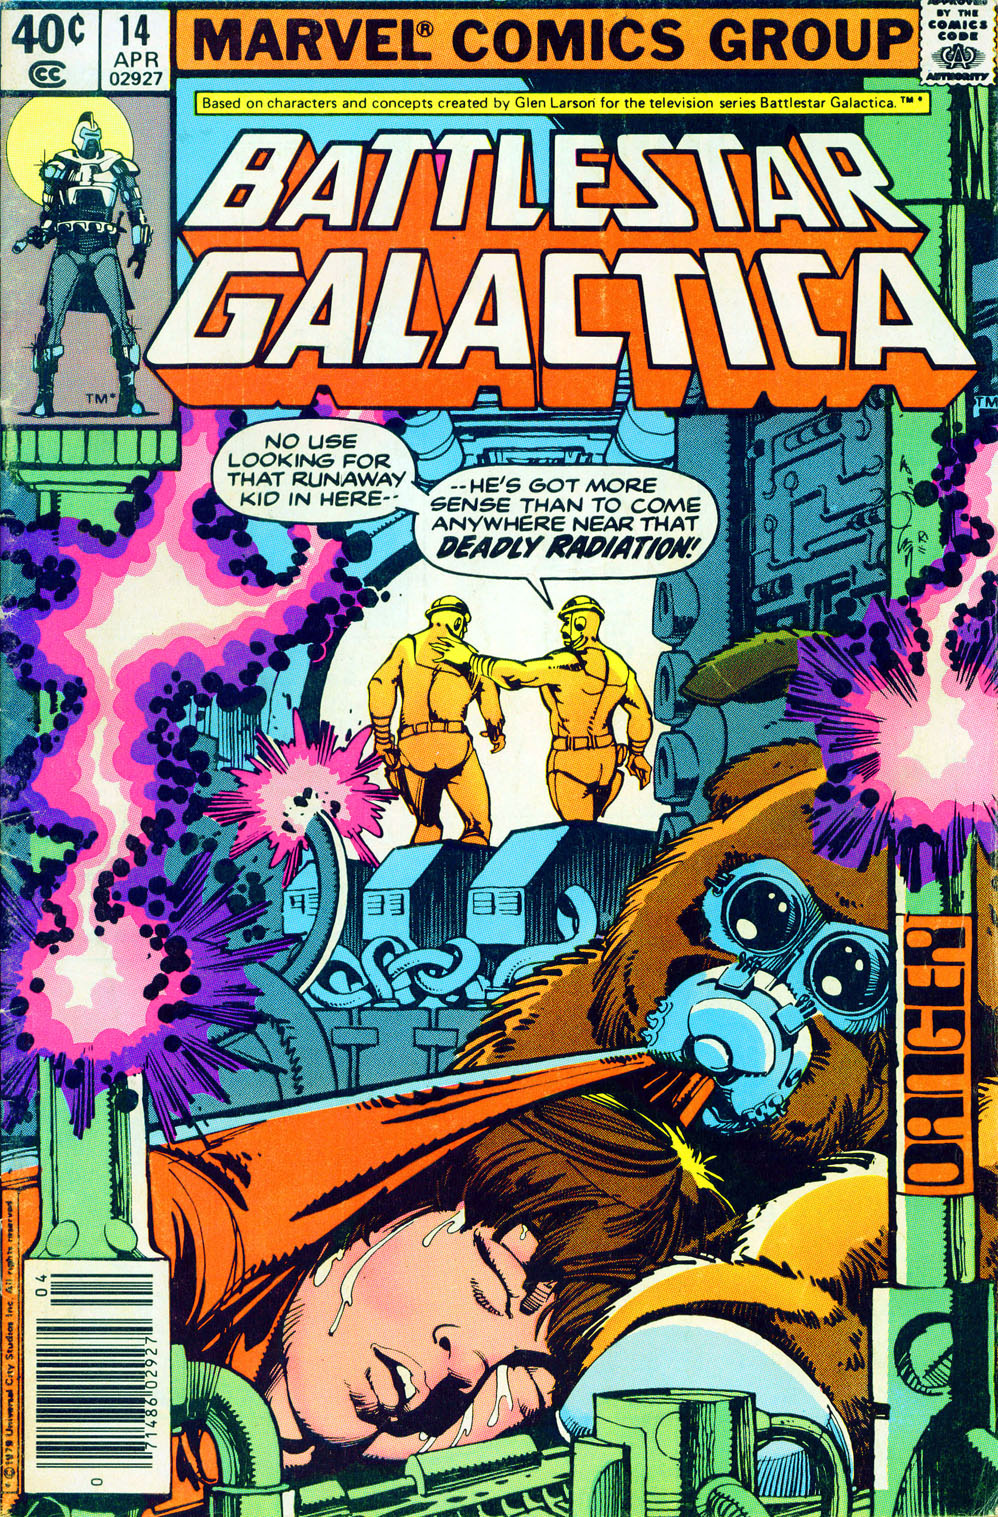 Battlestar Galactica 14 Page 1